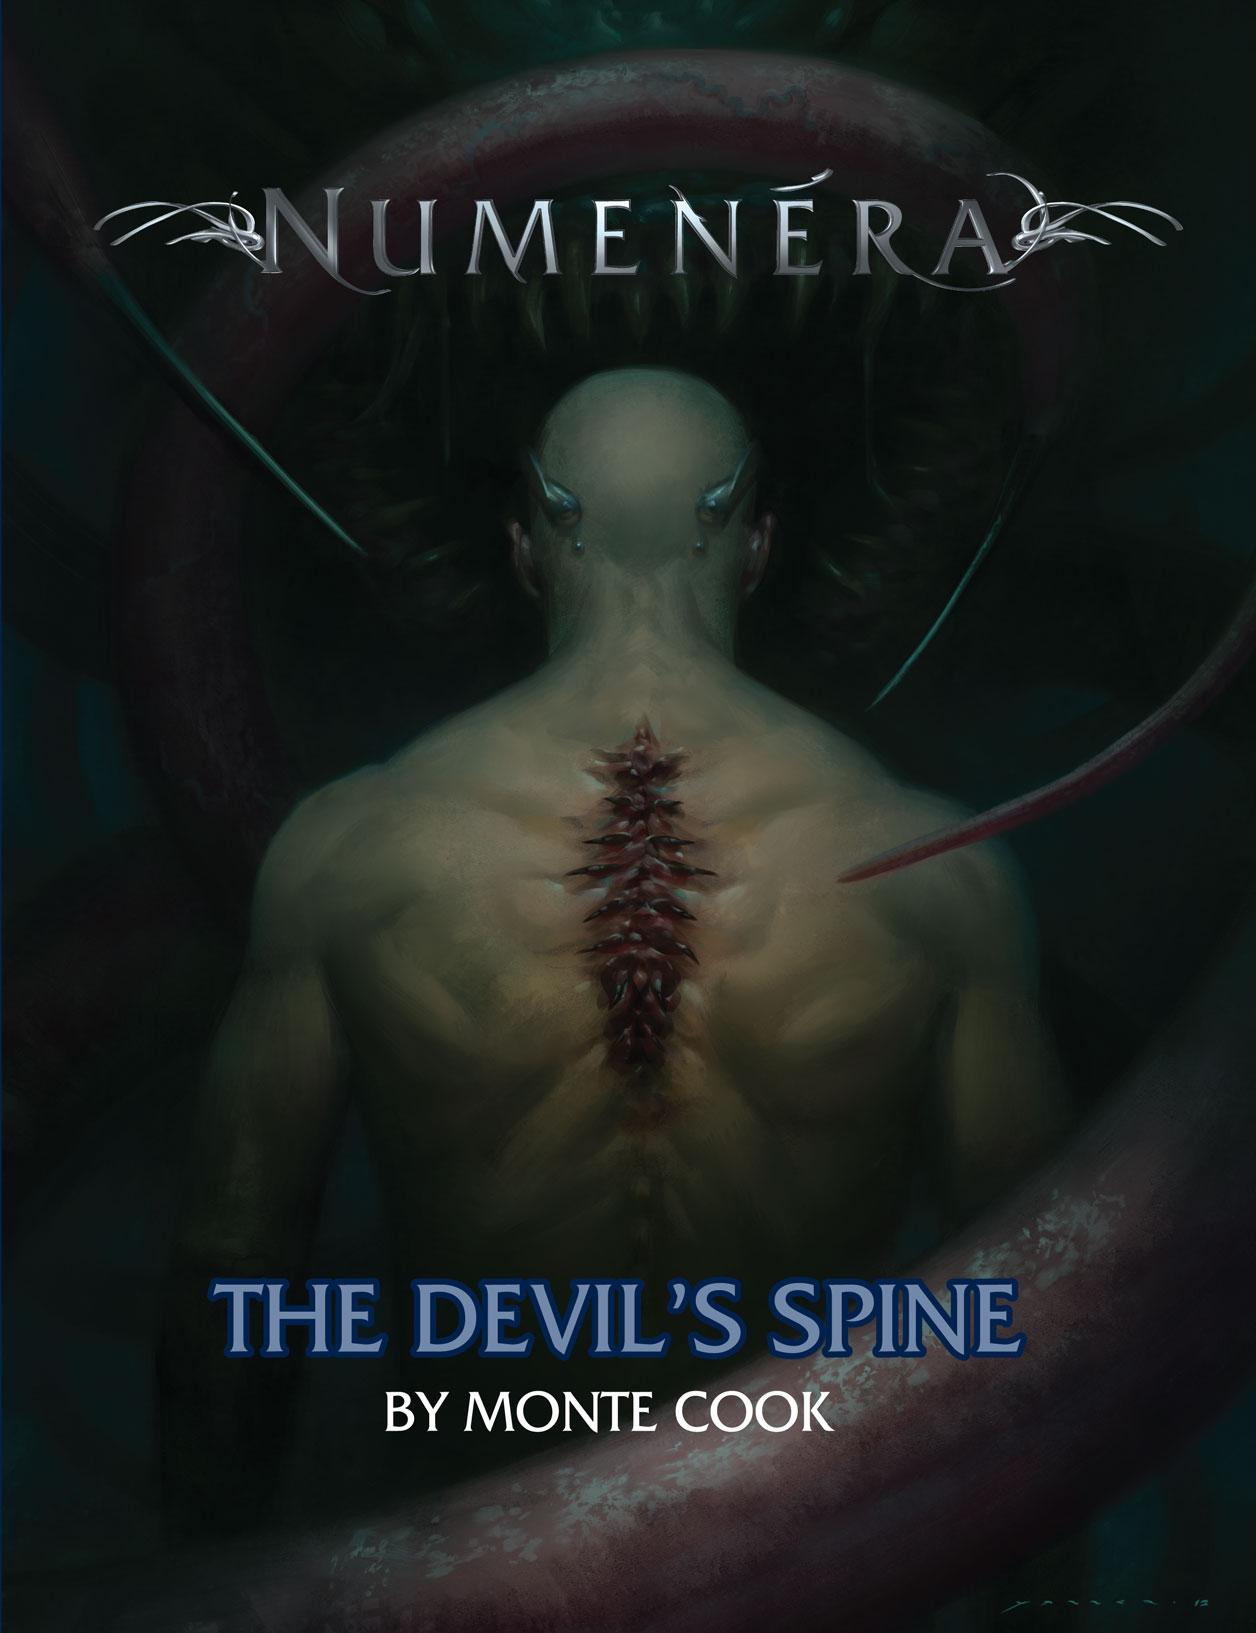 Parasites, Viruses & Underwater Tales Courtesy of The Devil'sSpine